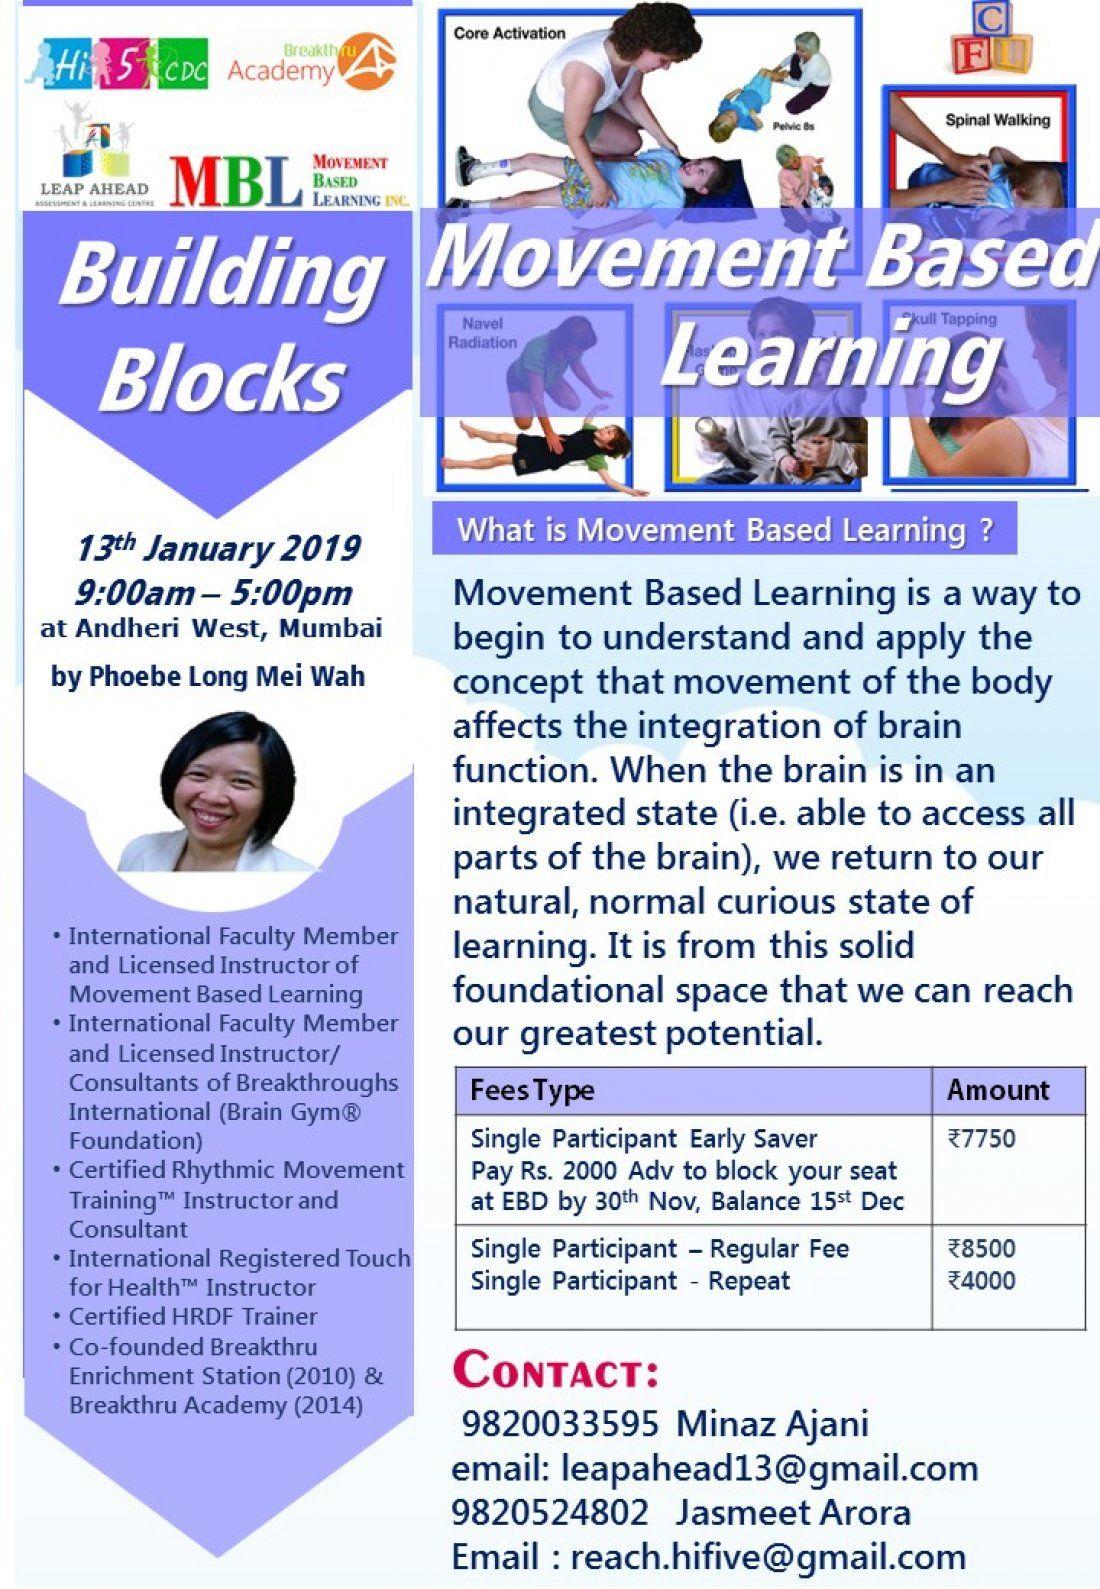 Building Blocks - Movement Based Learning